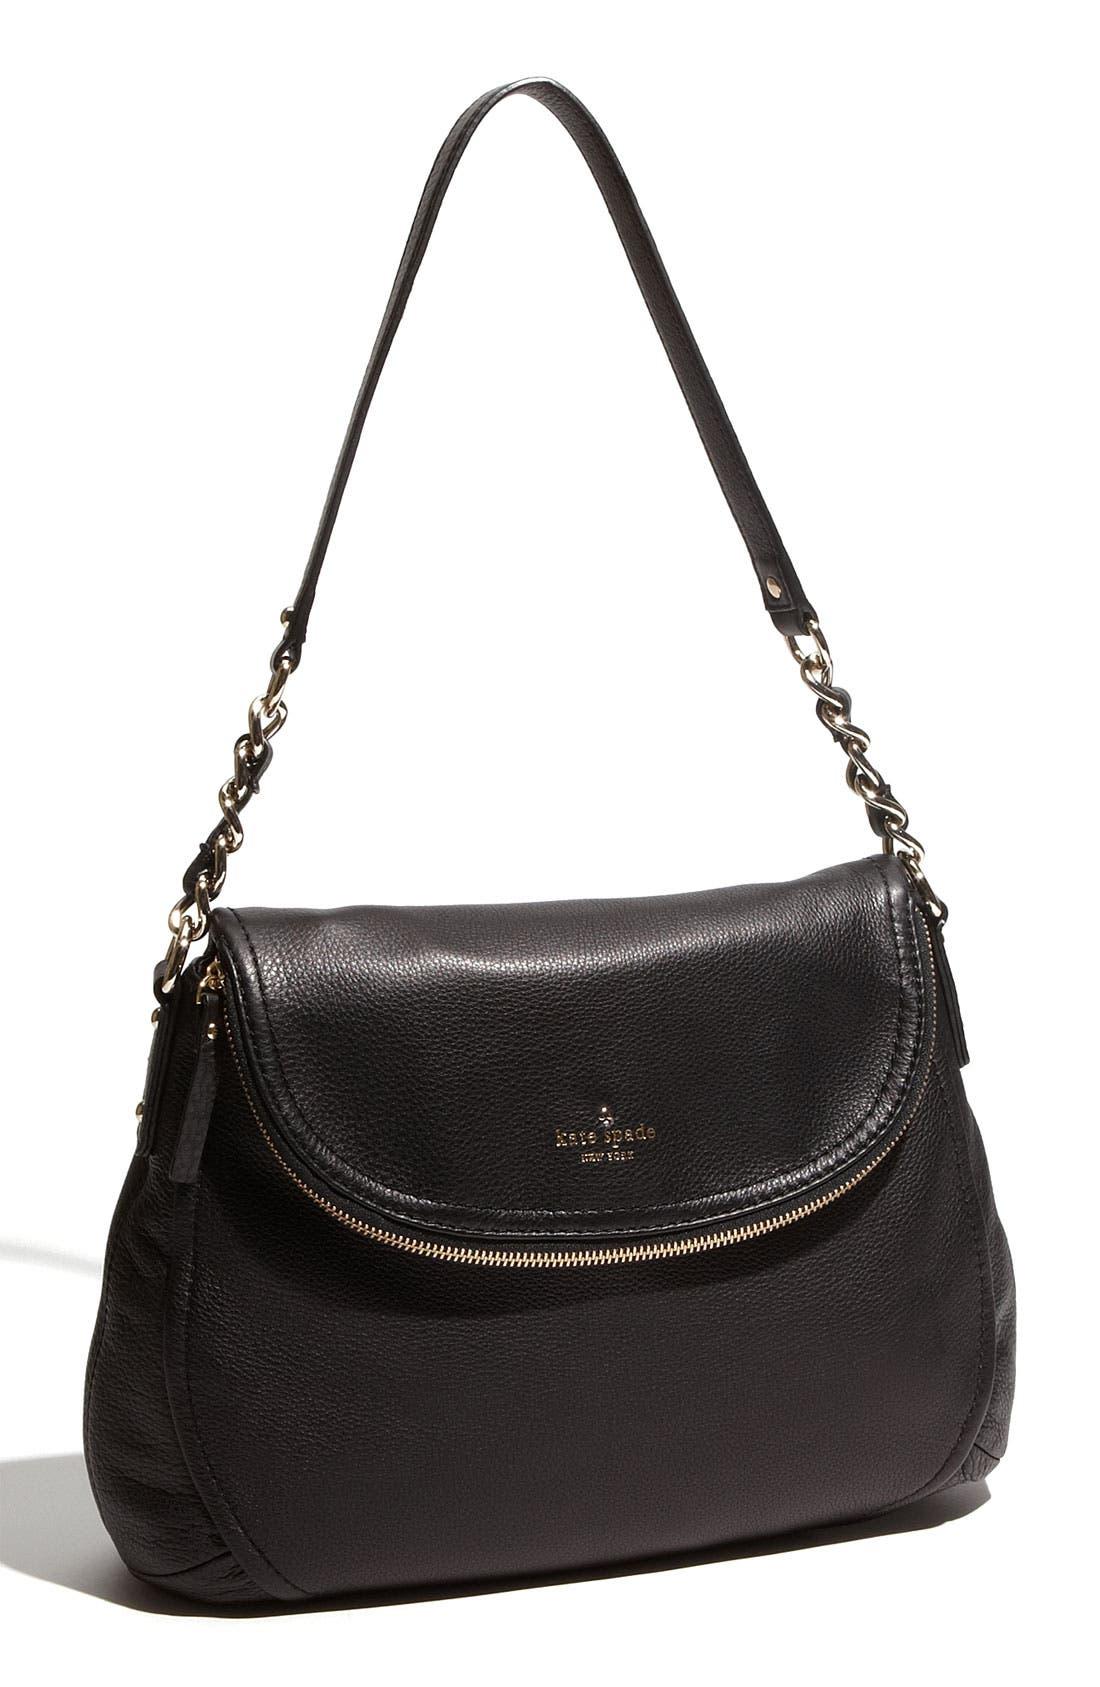 Main Image - kate spade new york 'cobble hill - penny' shoulder bag